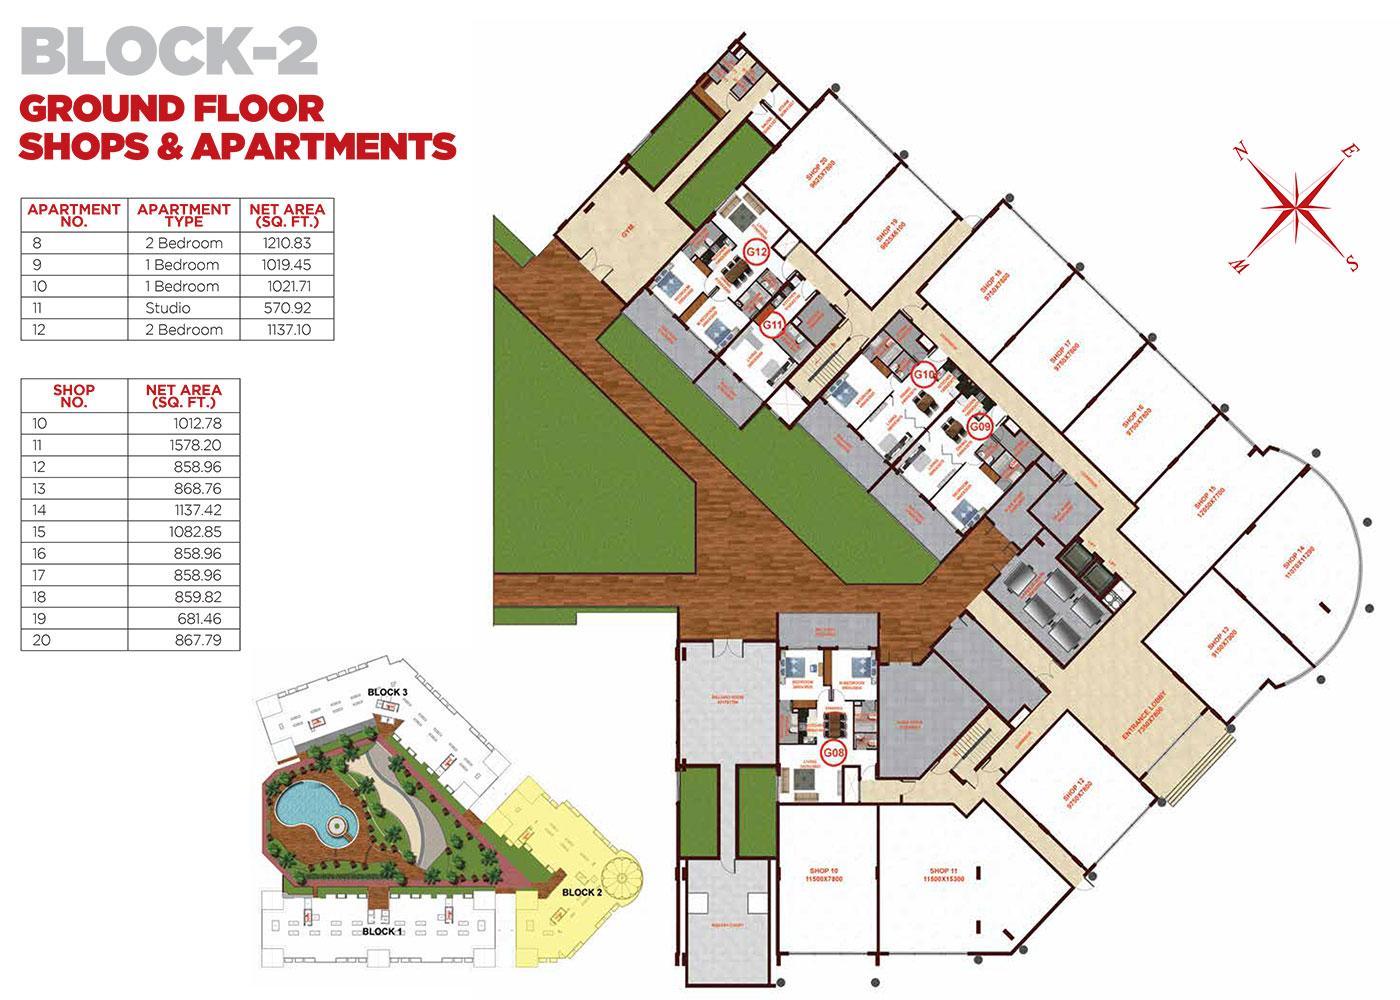 Ground Floor Apartments Block 2